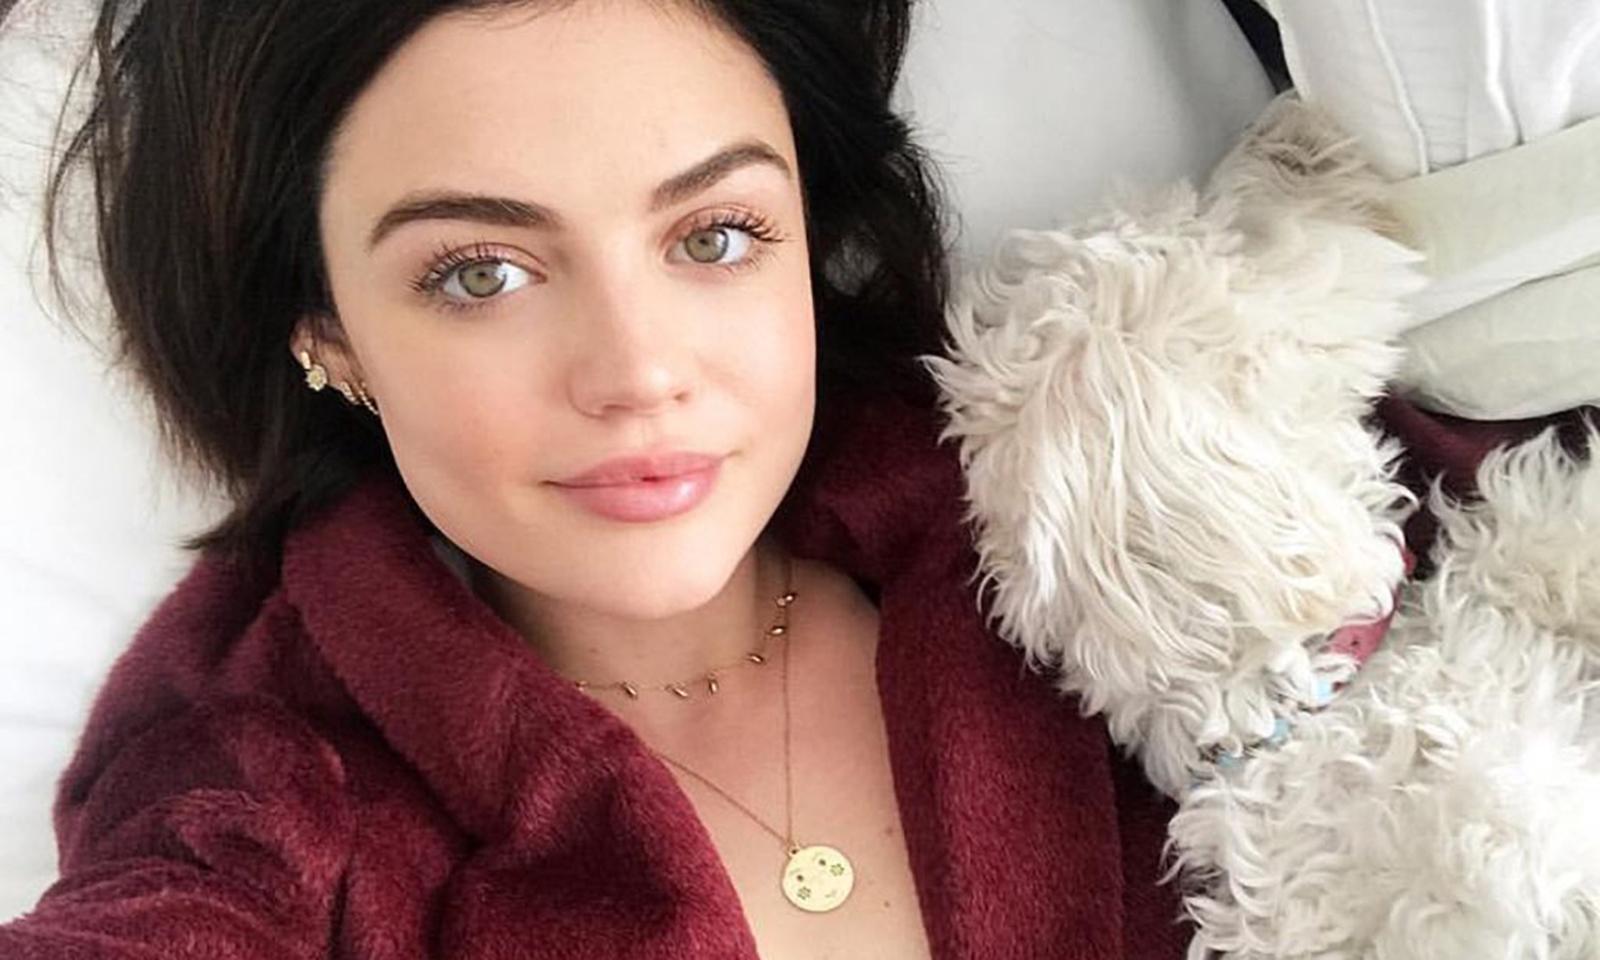 natural-makeup-lucy-hale-instagram-selfie-beauty-main-image